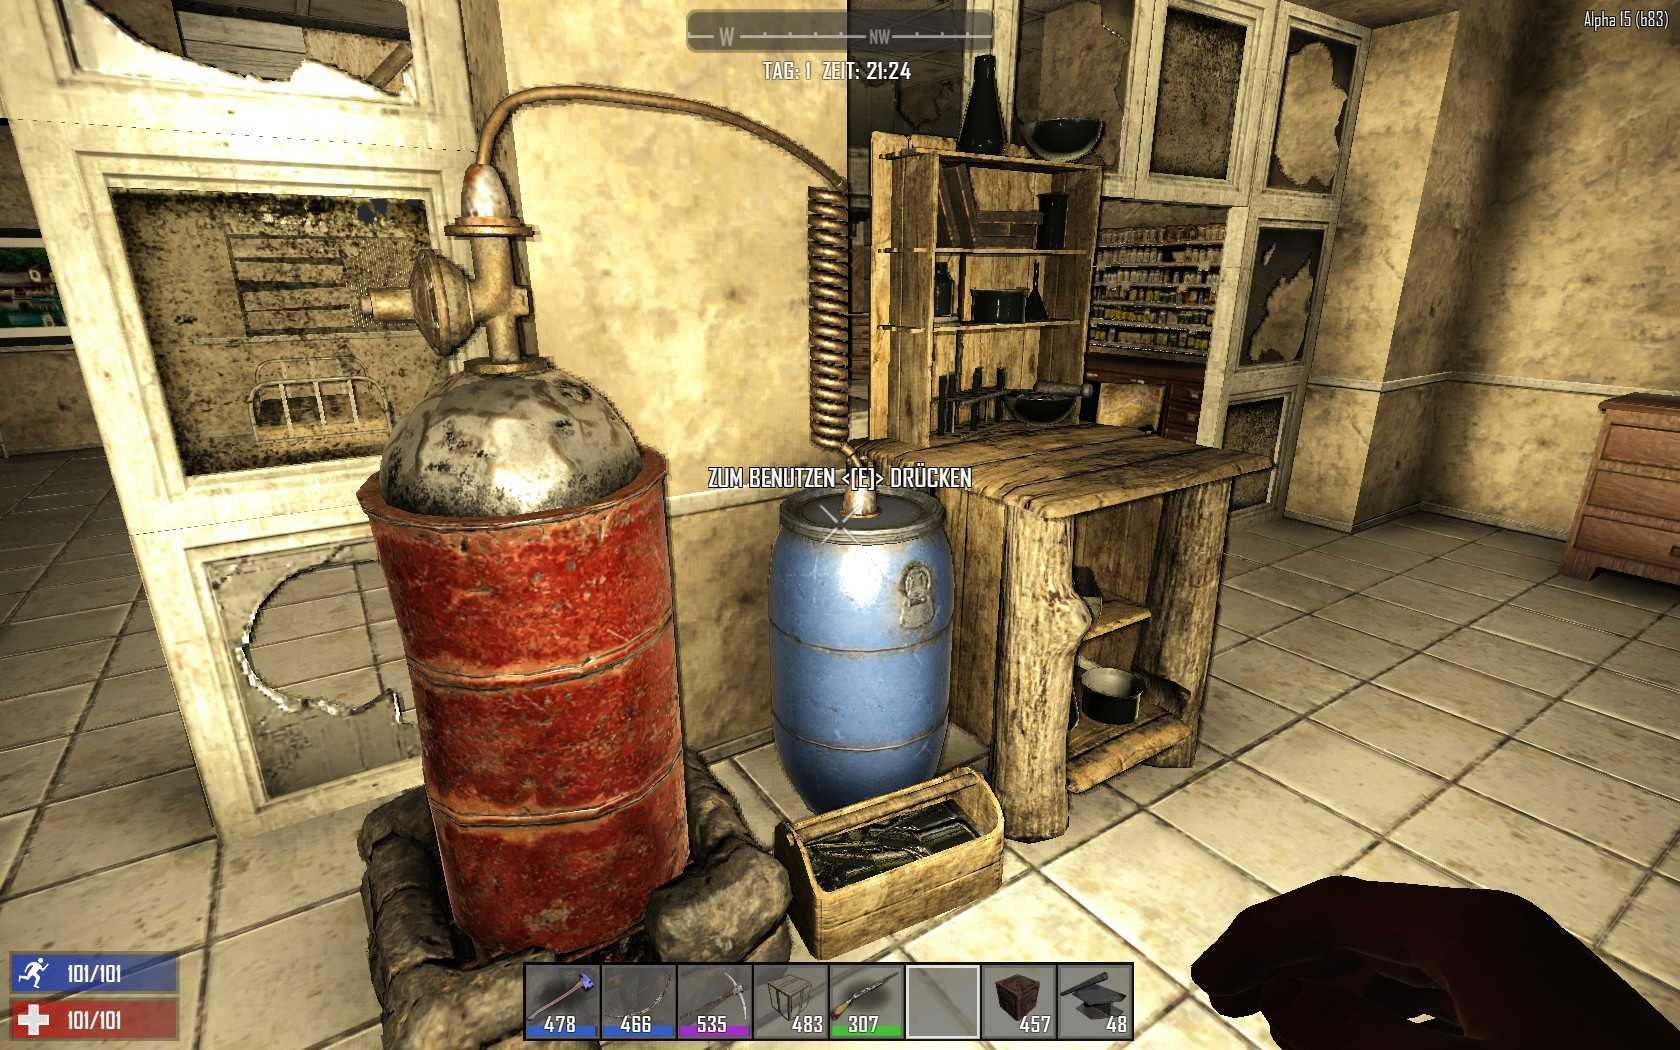 7dtd: Chemistry Station